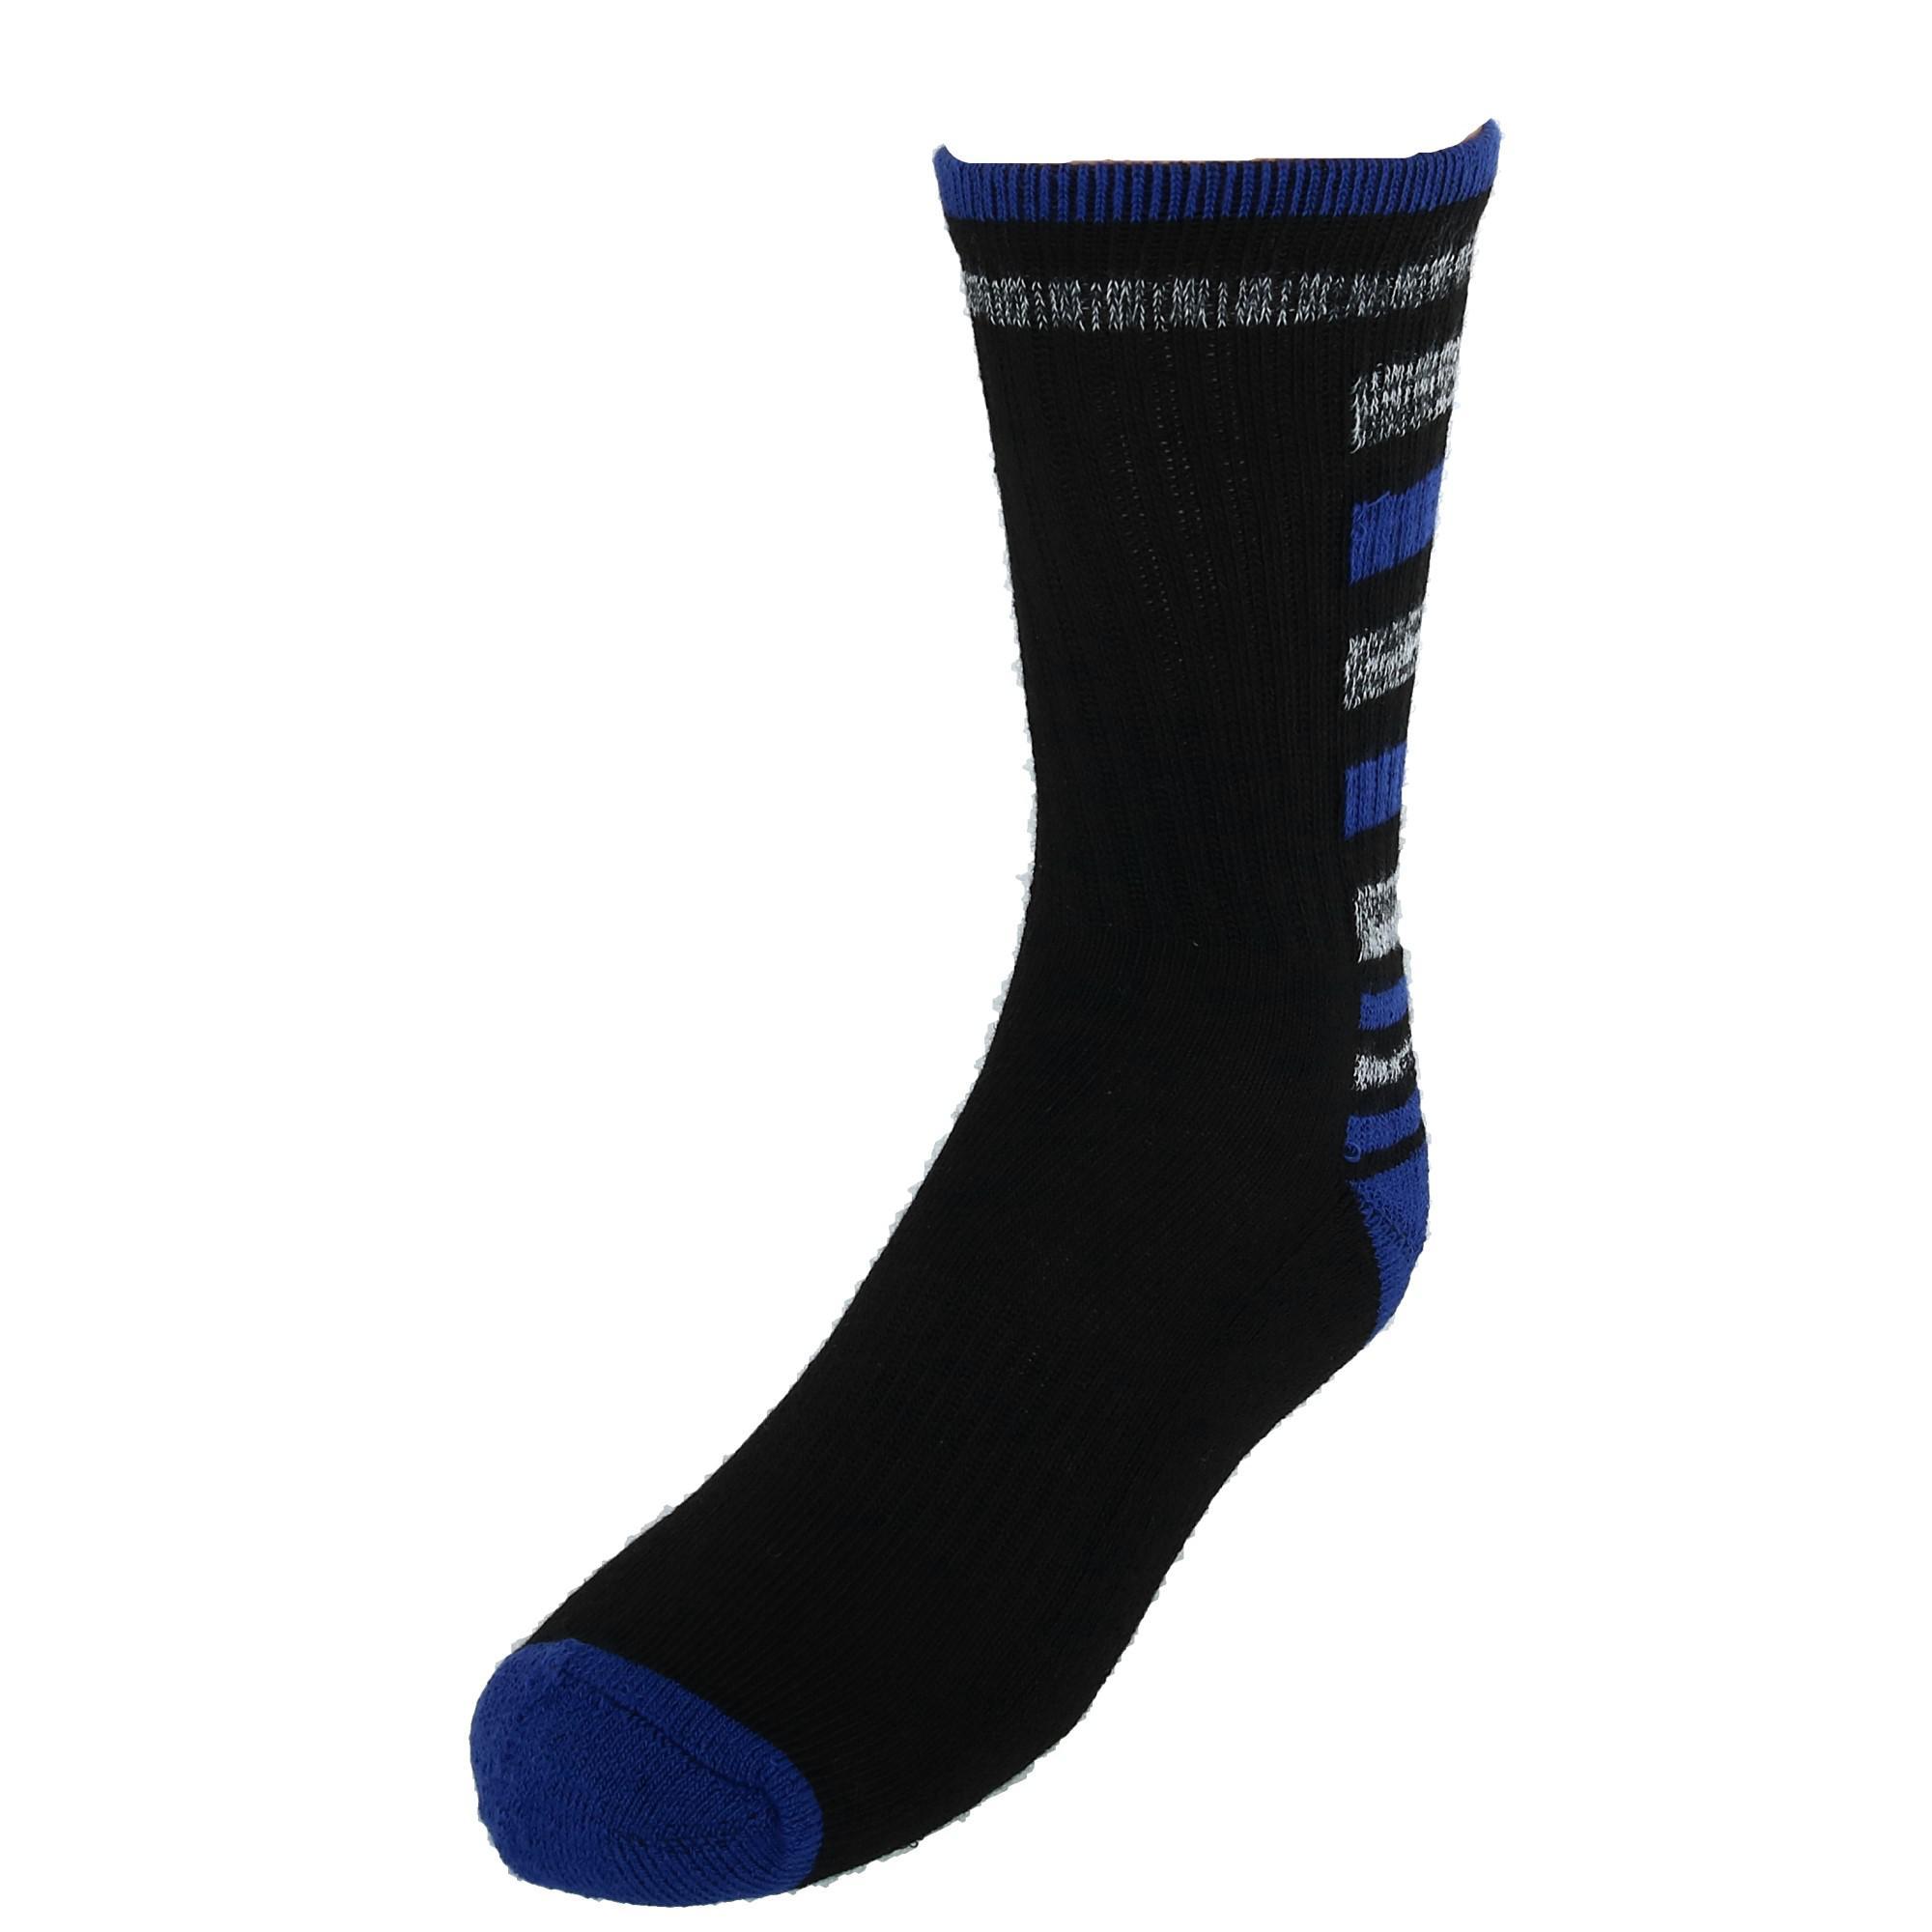 4 Pair Pack New Densley /& Co Boys Athletic Crew Socks